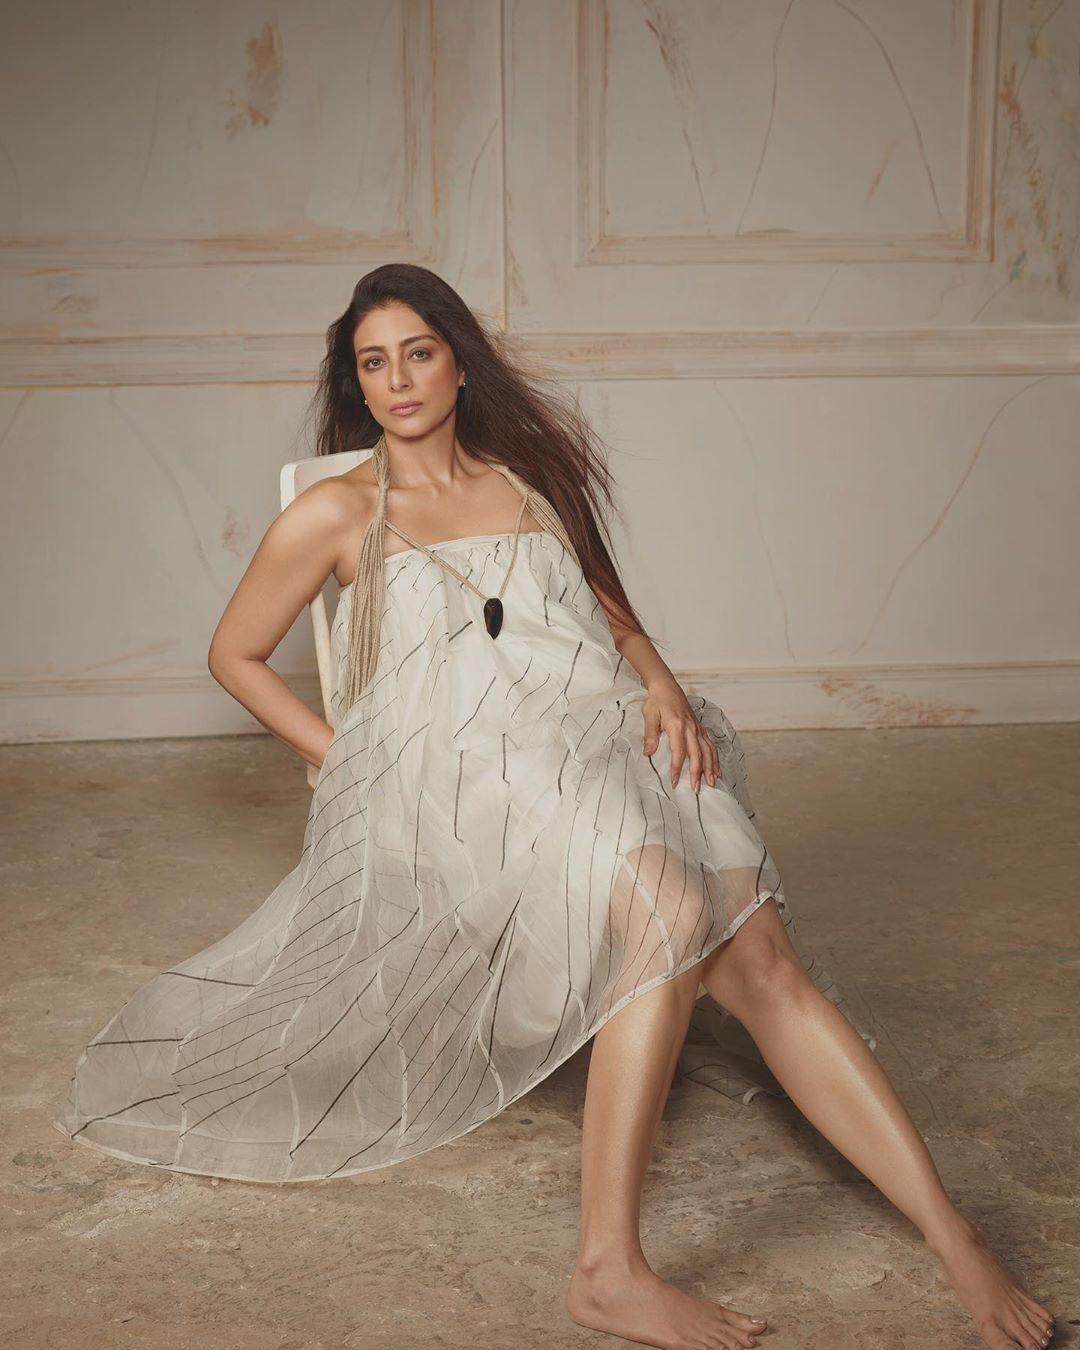 Deepika Padukone Bare Feet - Deepika Padukone Age